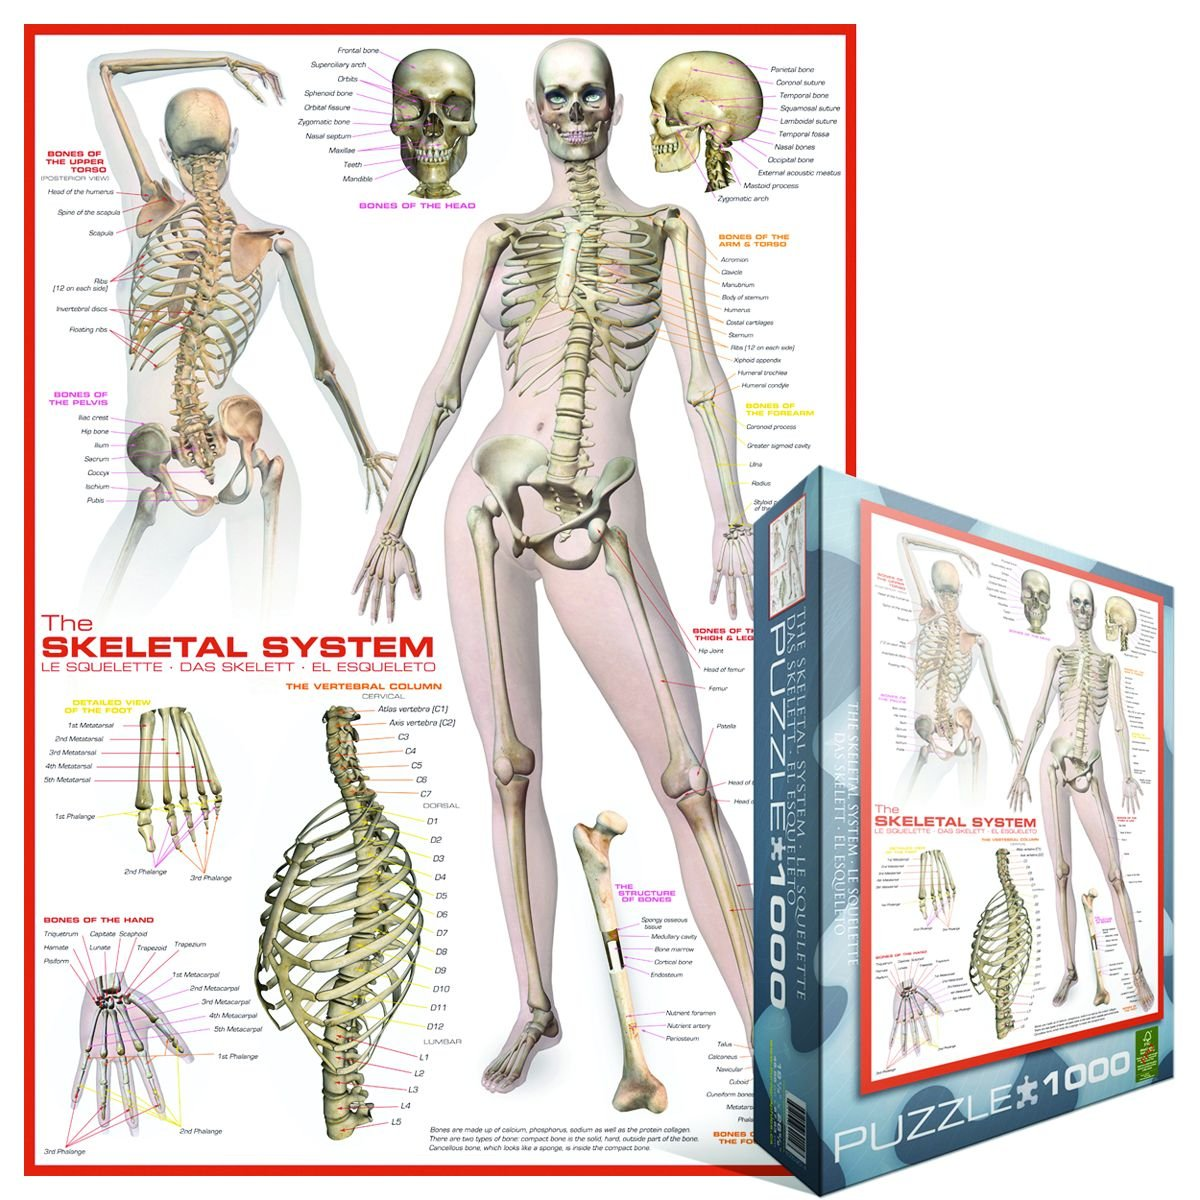 Amazon Eurographics Skeletal System Human Body 1000 Piece